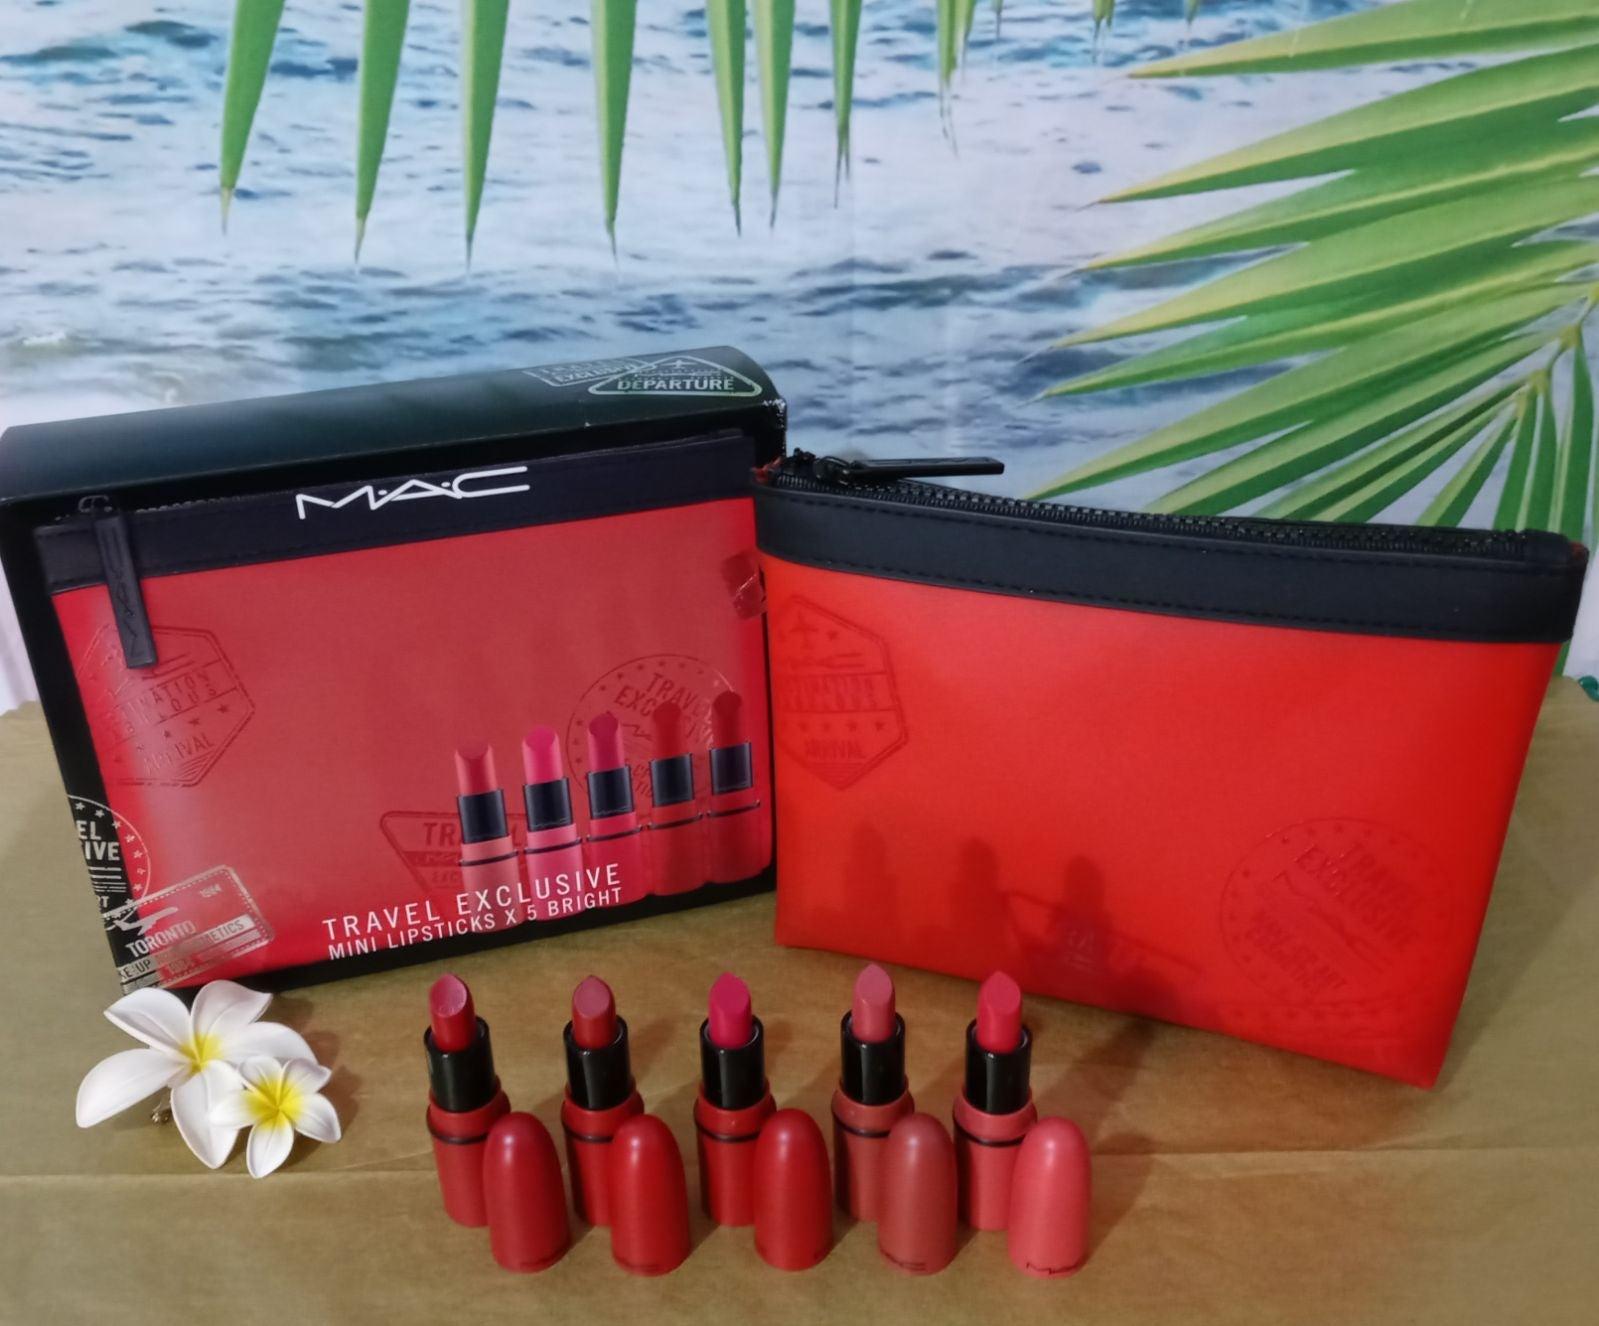 MAC Travel Exclusive Mini Lipsticks X 5